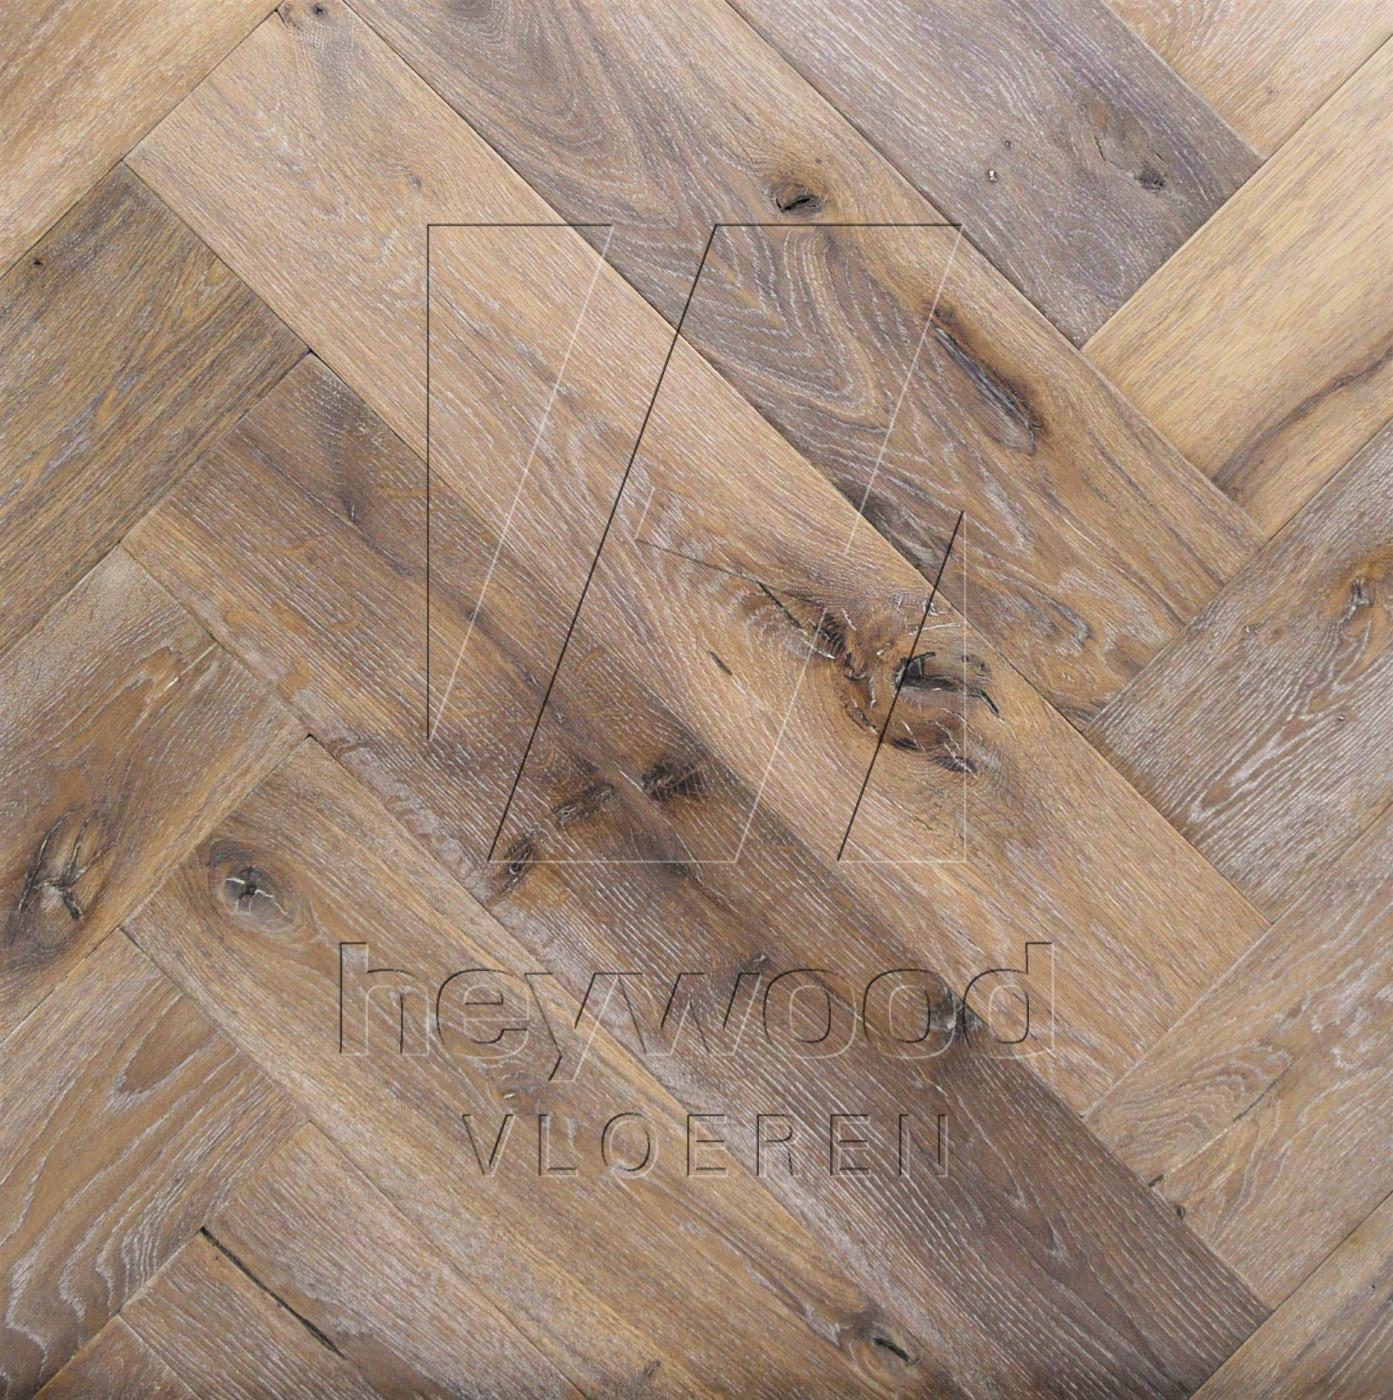 Antique Herringbone 'Aconcagua' in Herringbone of Pattern & Panel Floors